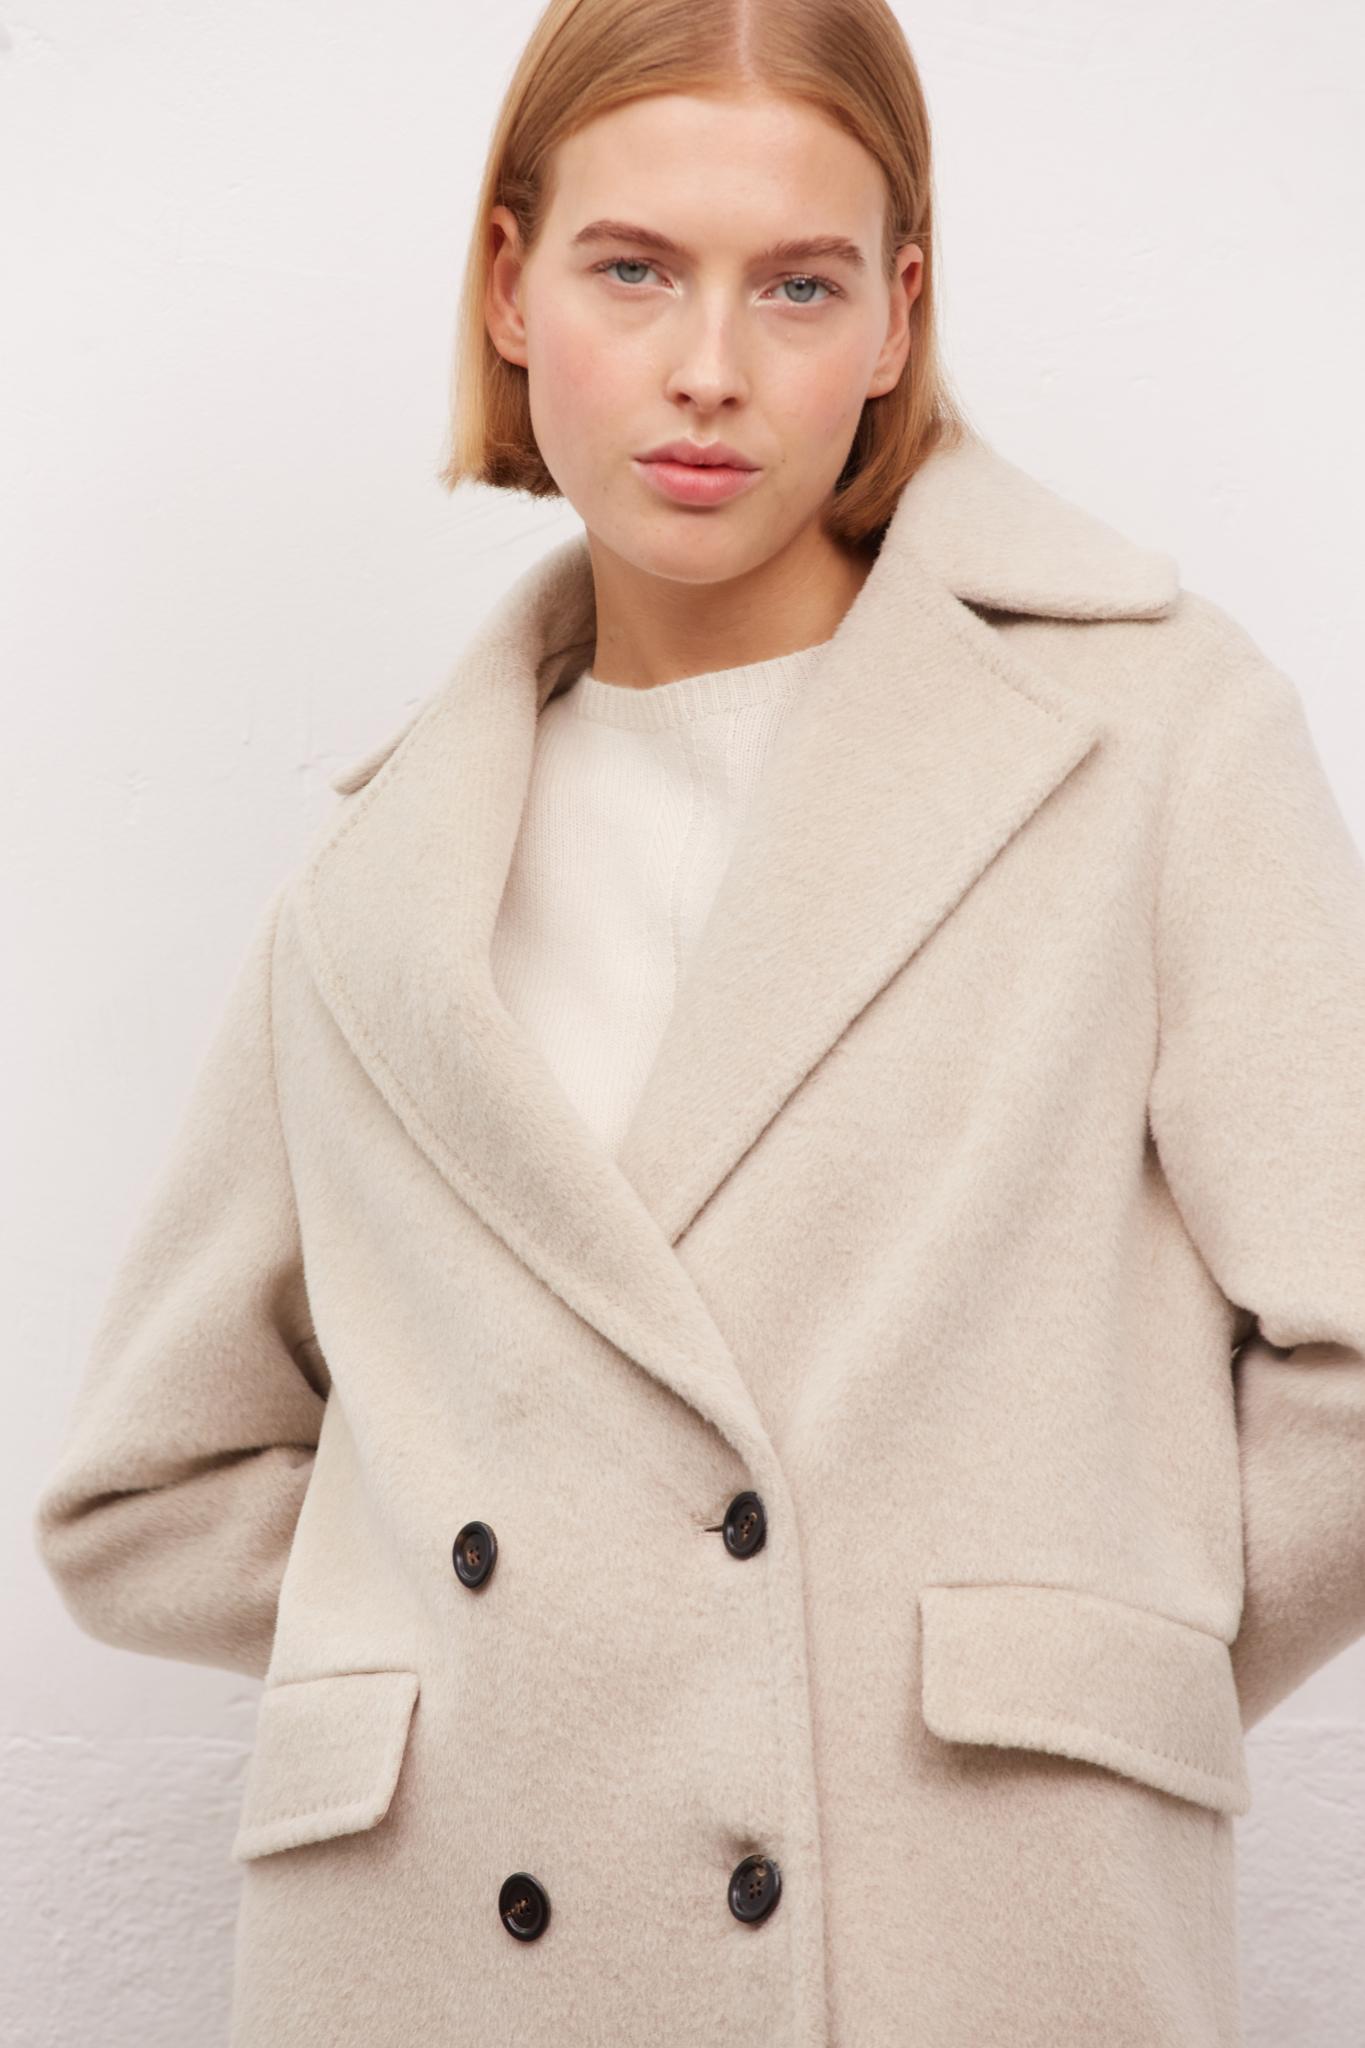 STEFANY - Пальто из шерсти альпаки